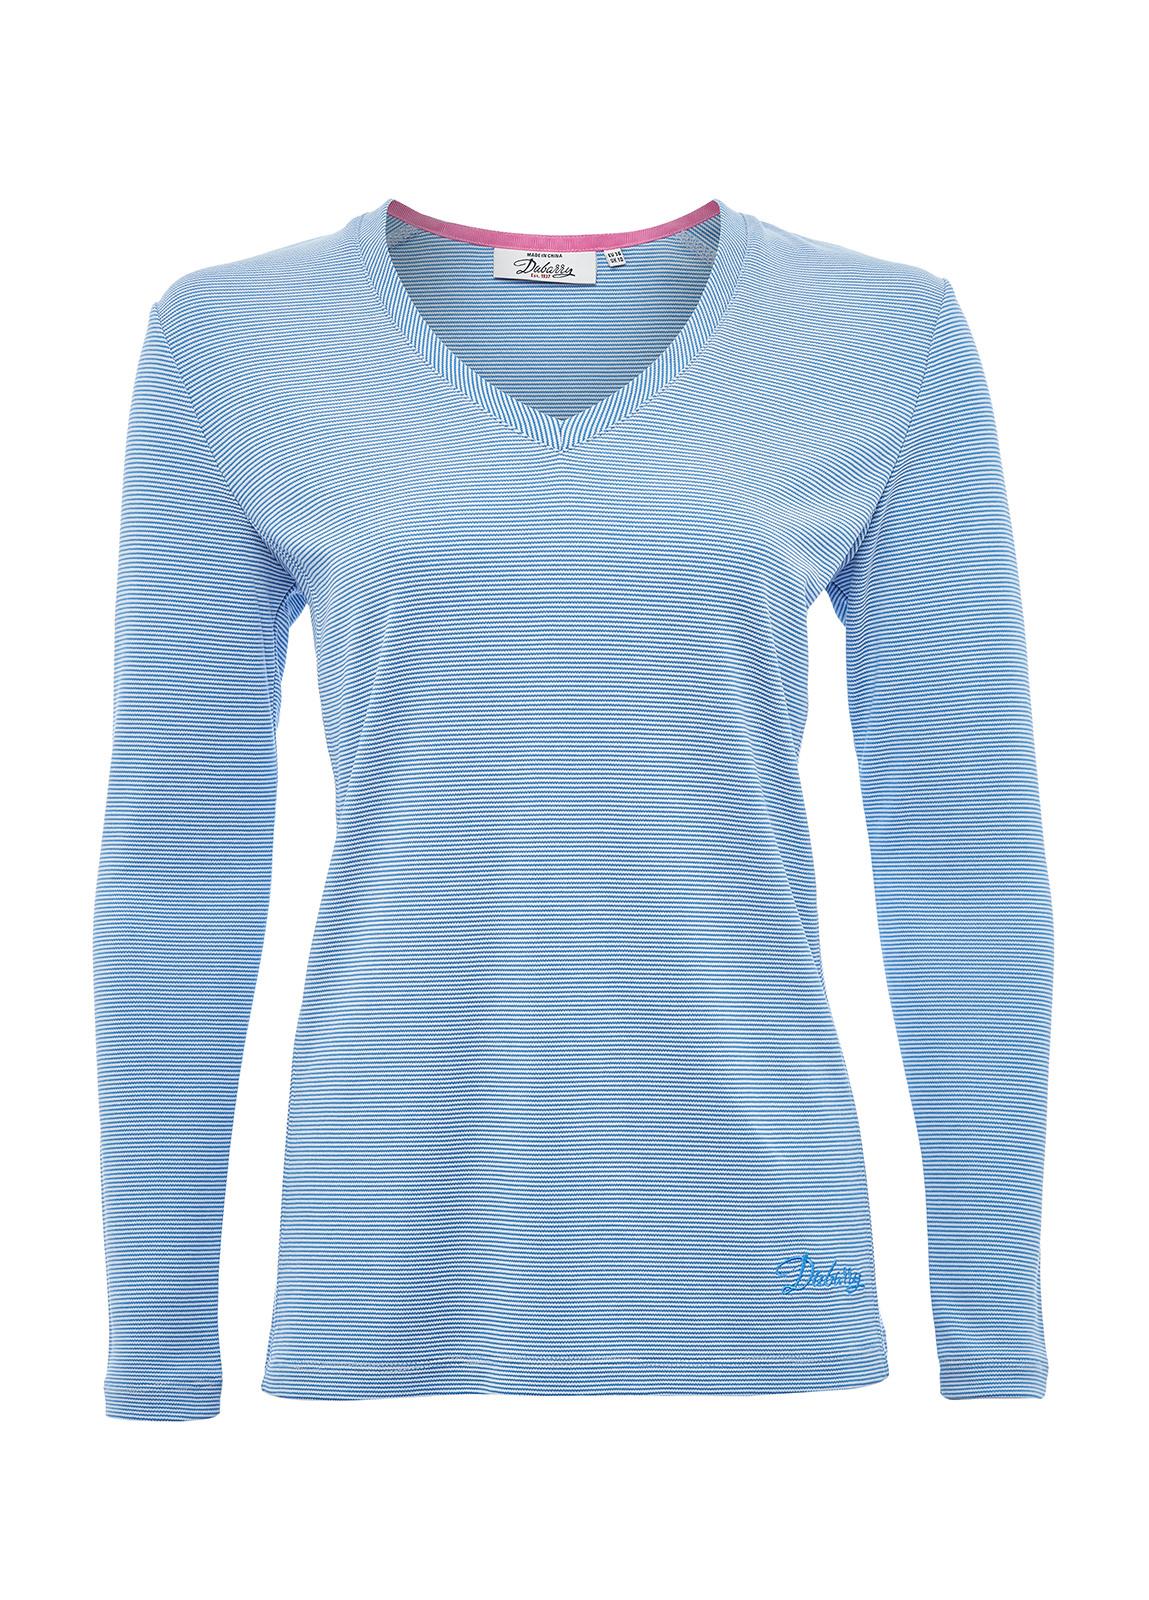 Dubarry_ Portumna Long-sleeved Top - Blue_Image_2